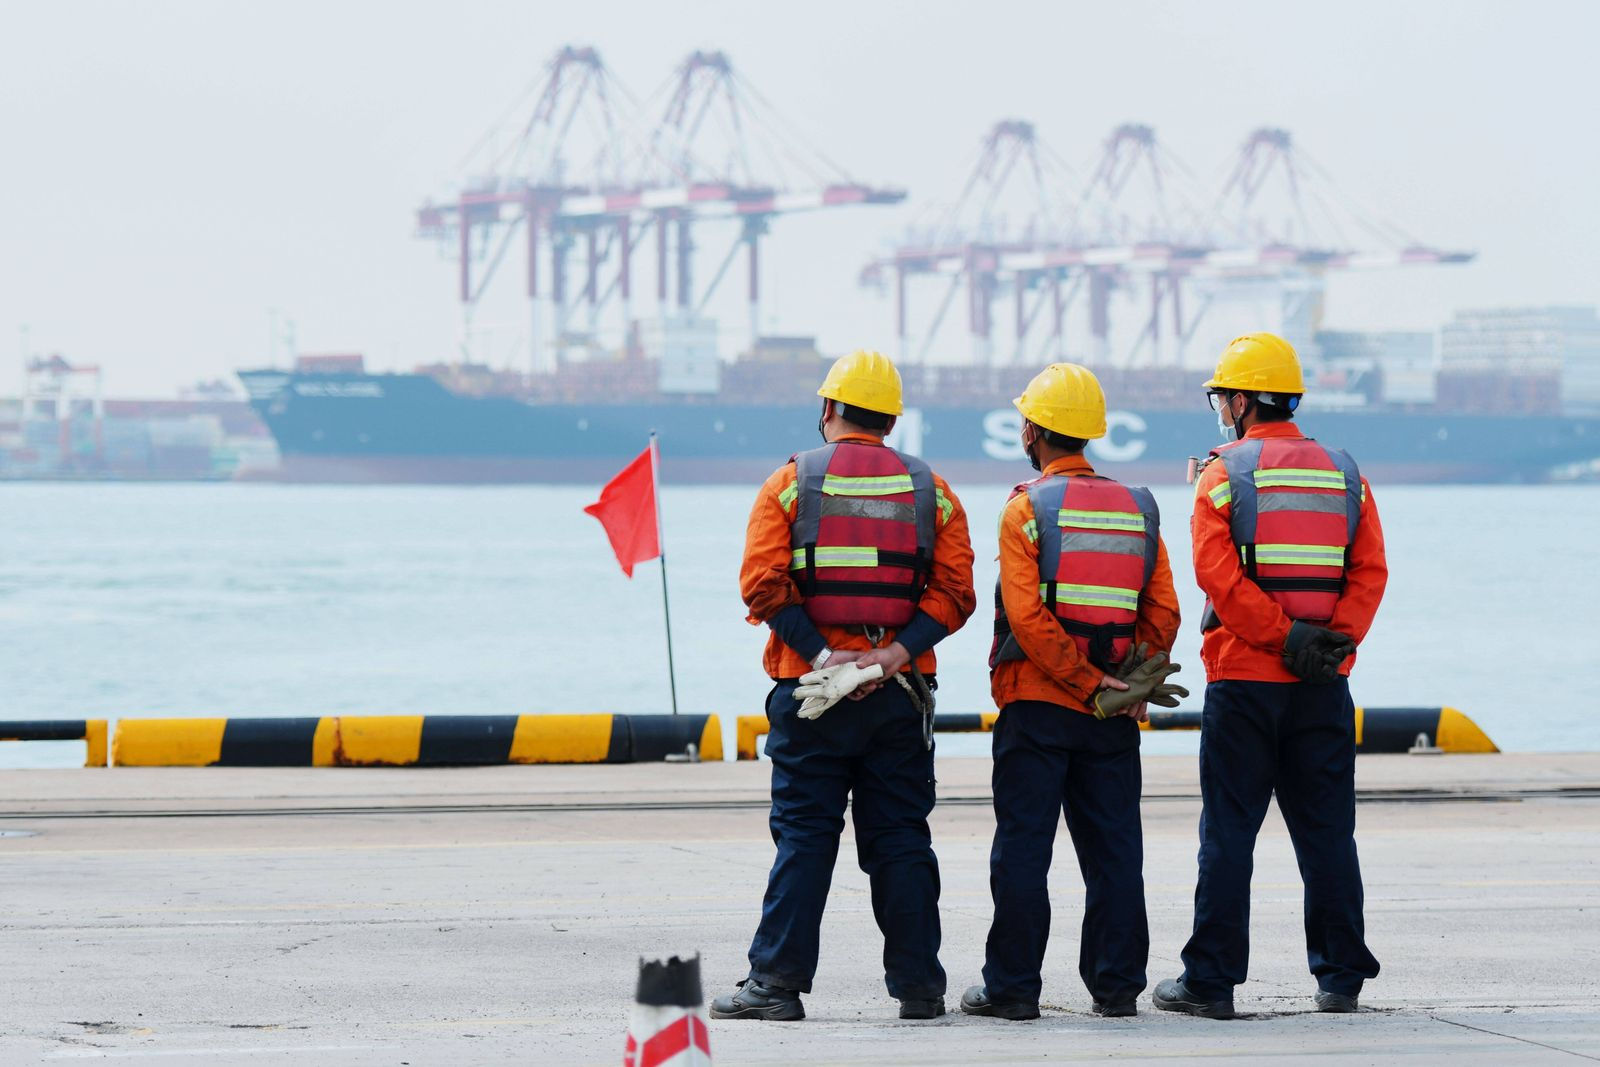 QINGDAO, CHINA - JUNE 02: Dock workers wait for cargo ships at Qingdao Port on June 2, 2020 in Qingdao, Shandong Provin